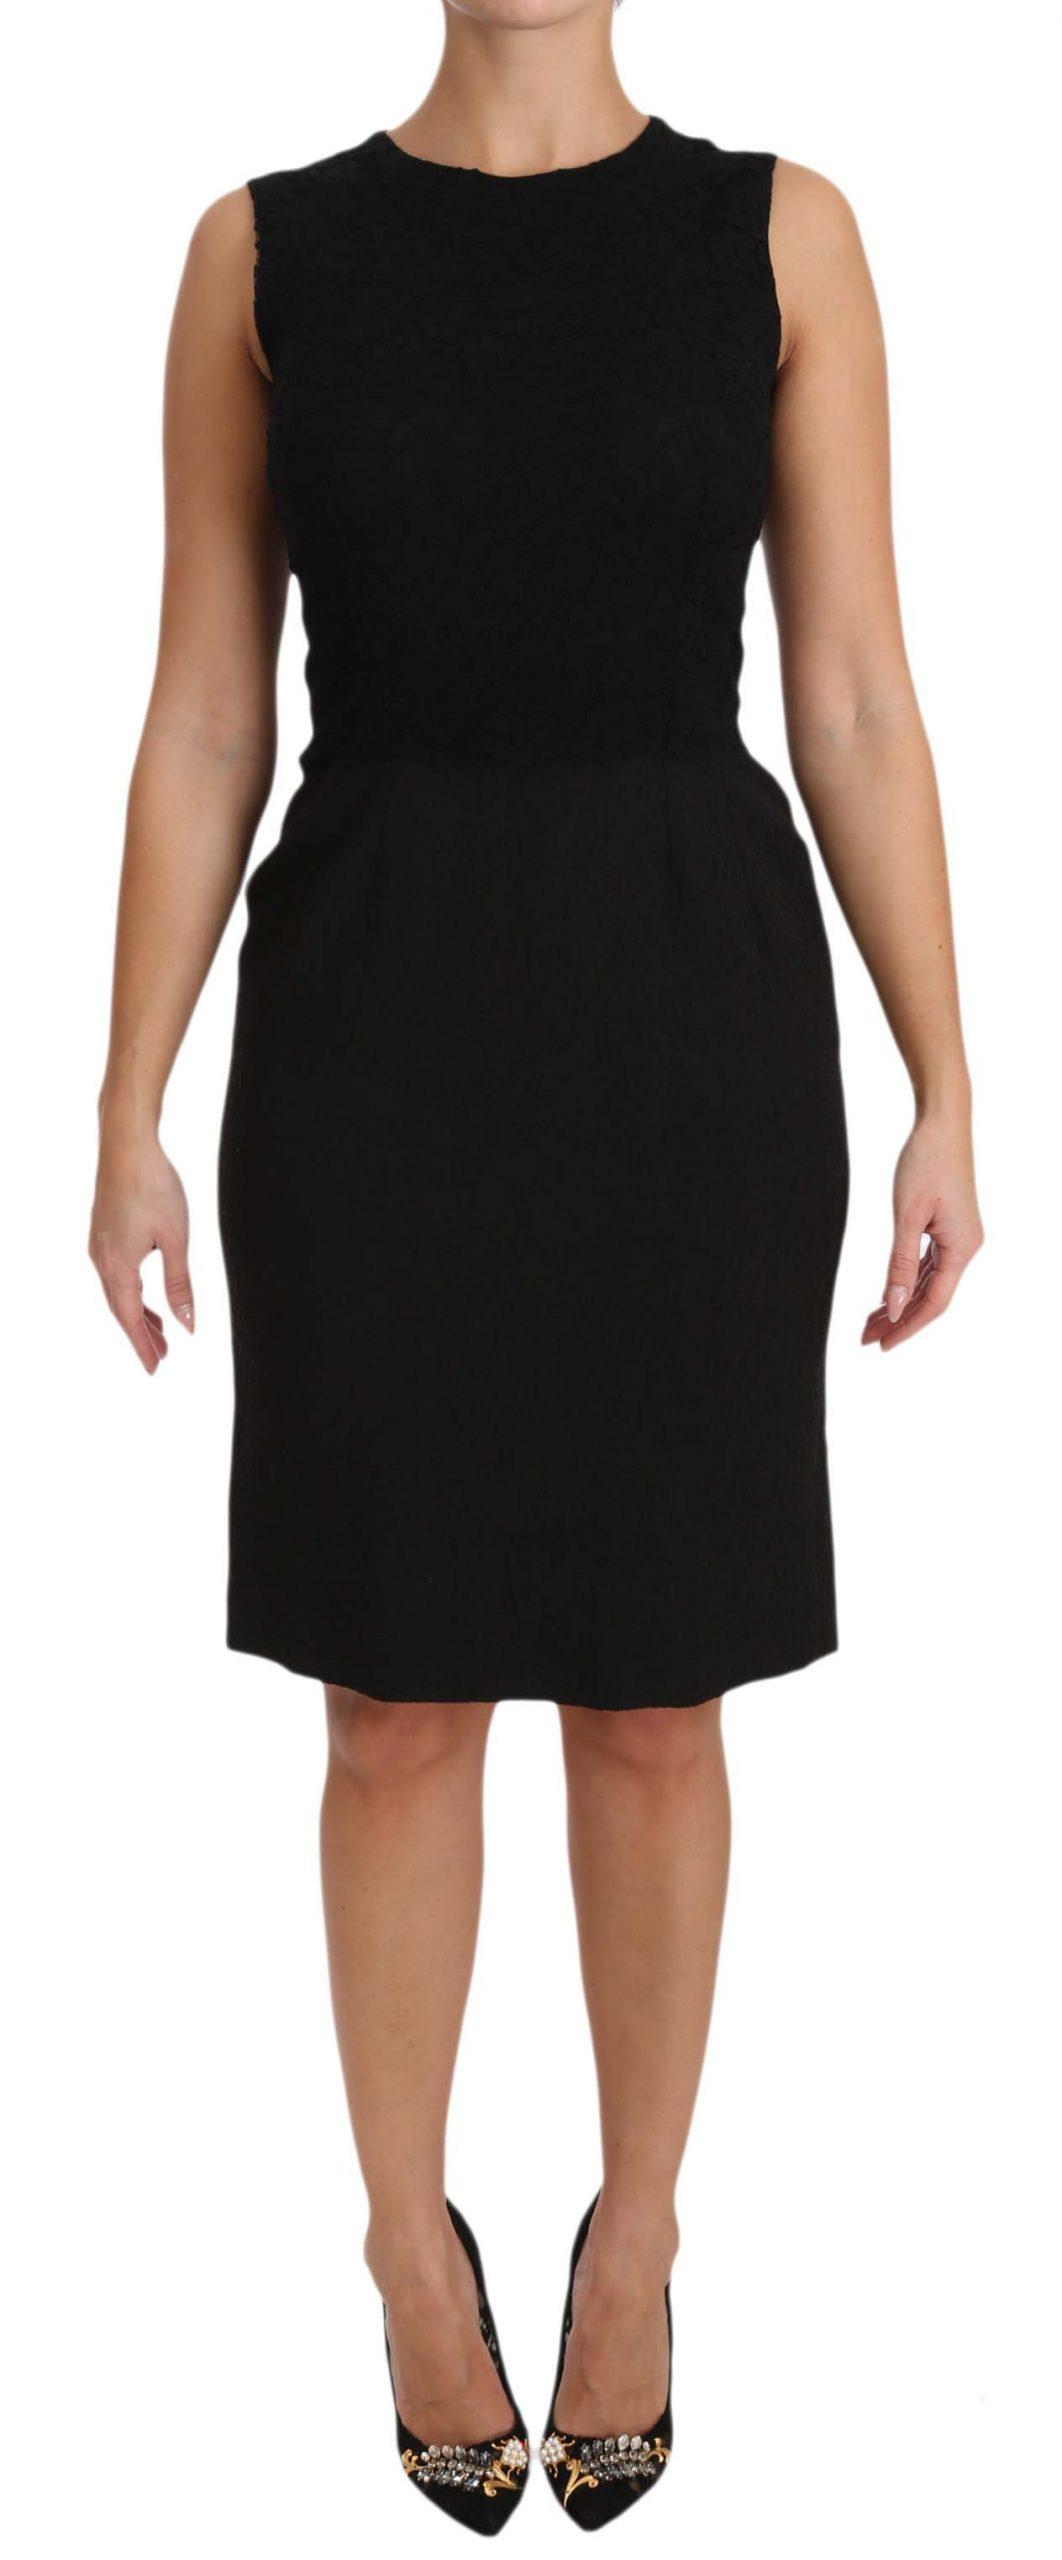 Dolce & Gabbana Women's Stretch Sheath Mini Dress Black DR1600 - IT40|S